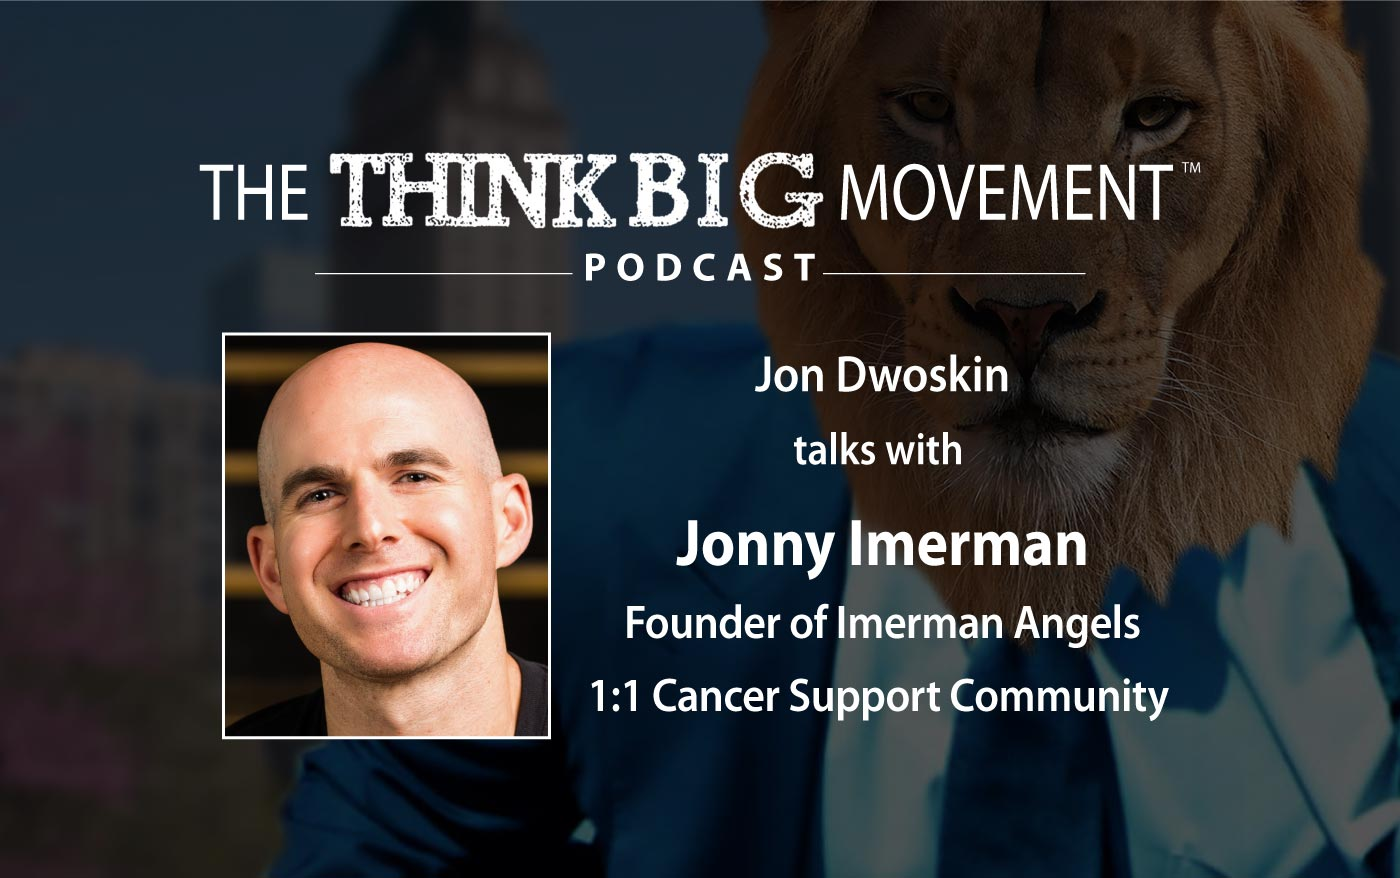 The Think Big Movement Podcast - Jon Dwoskin Interviews Jonny Imerman, Founder of Imerman Angels 1:1 Cancer Support Community